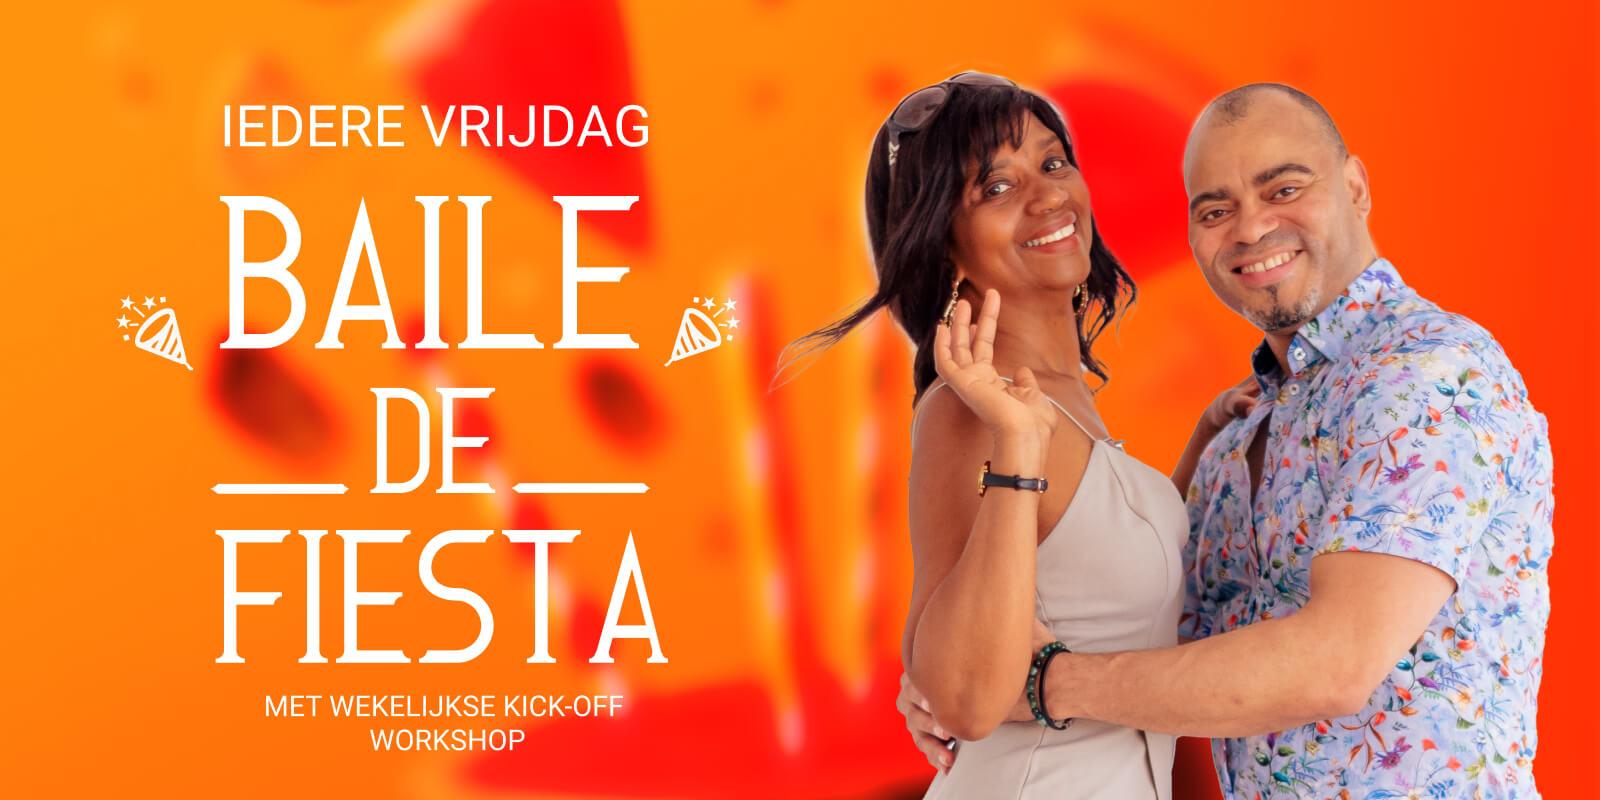 https://i2.wp.com/www.esencia.nl/wp-content/uploads/Fiesta.jpg?ssl=1